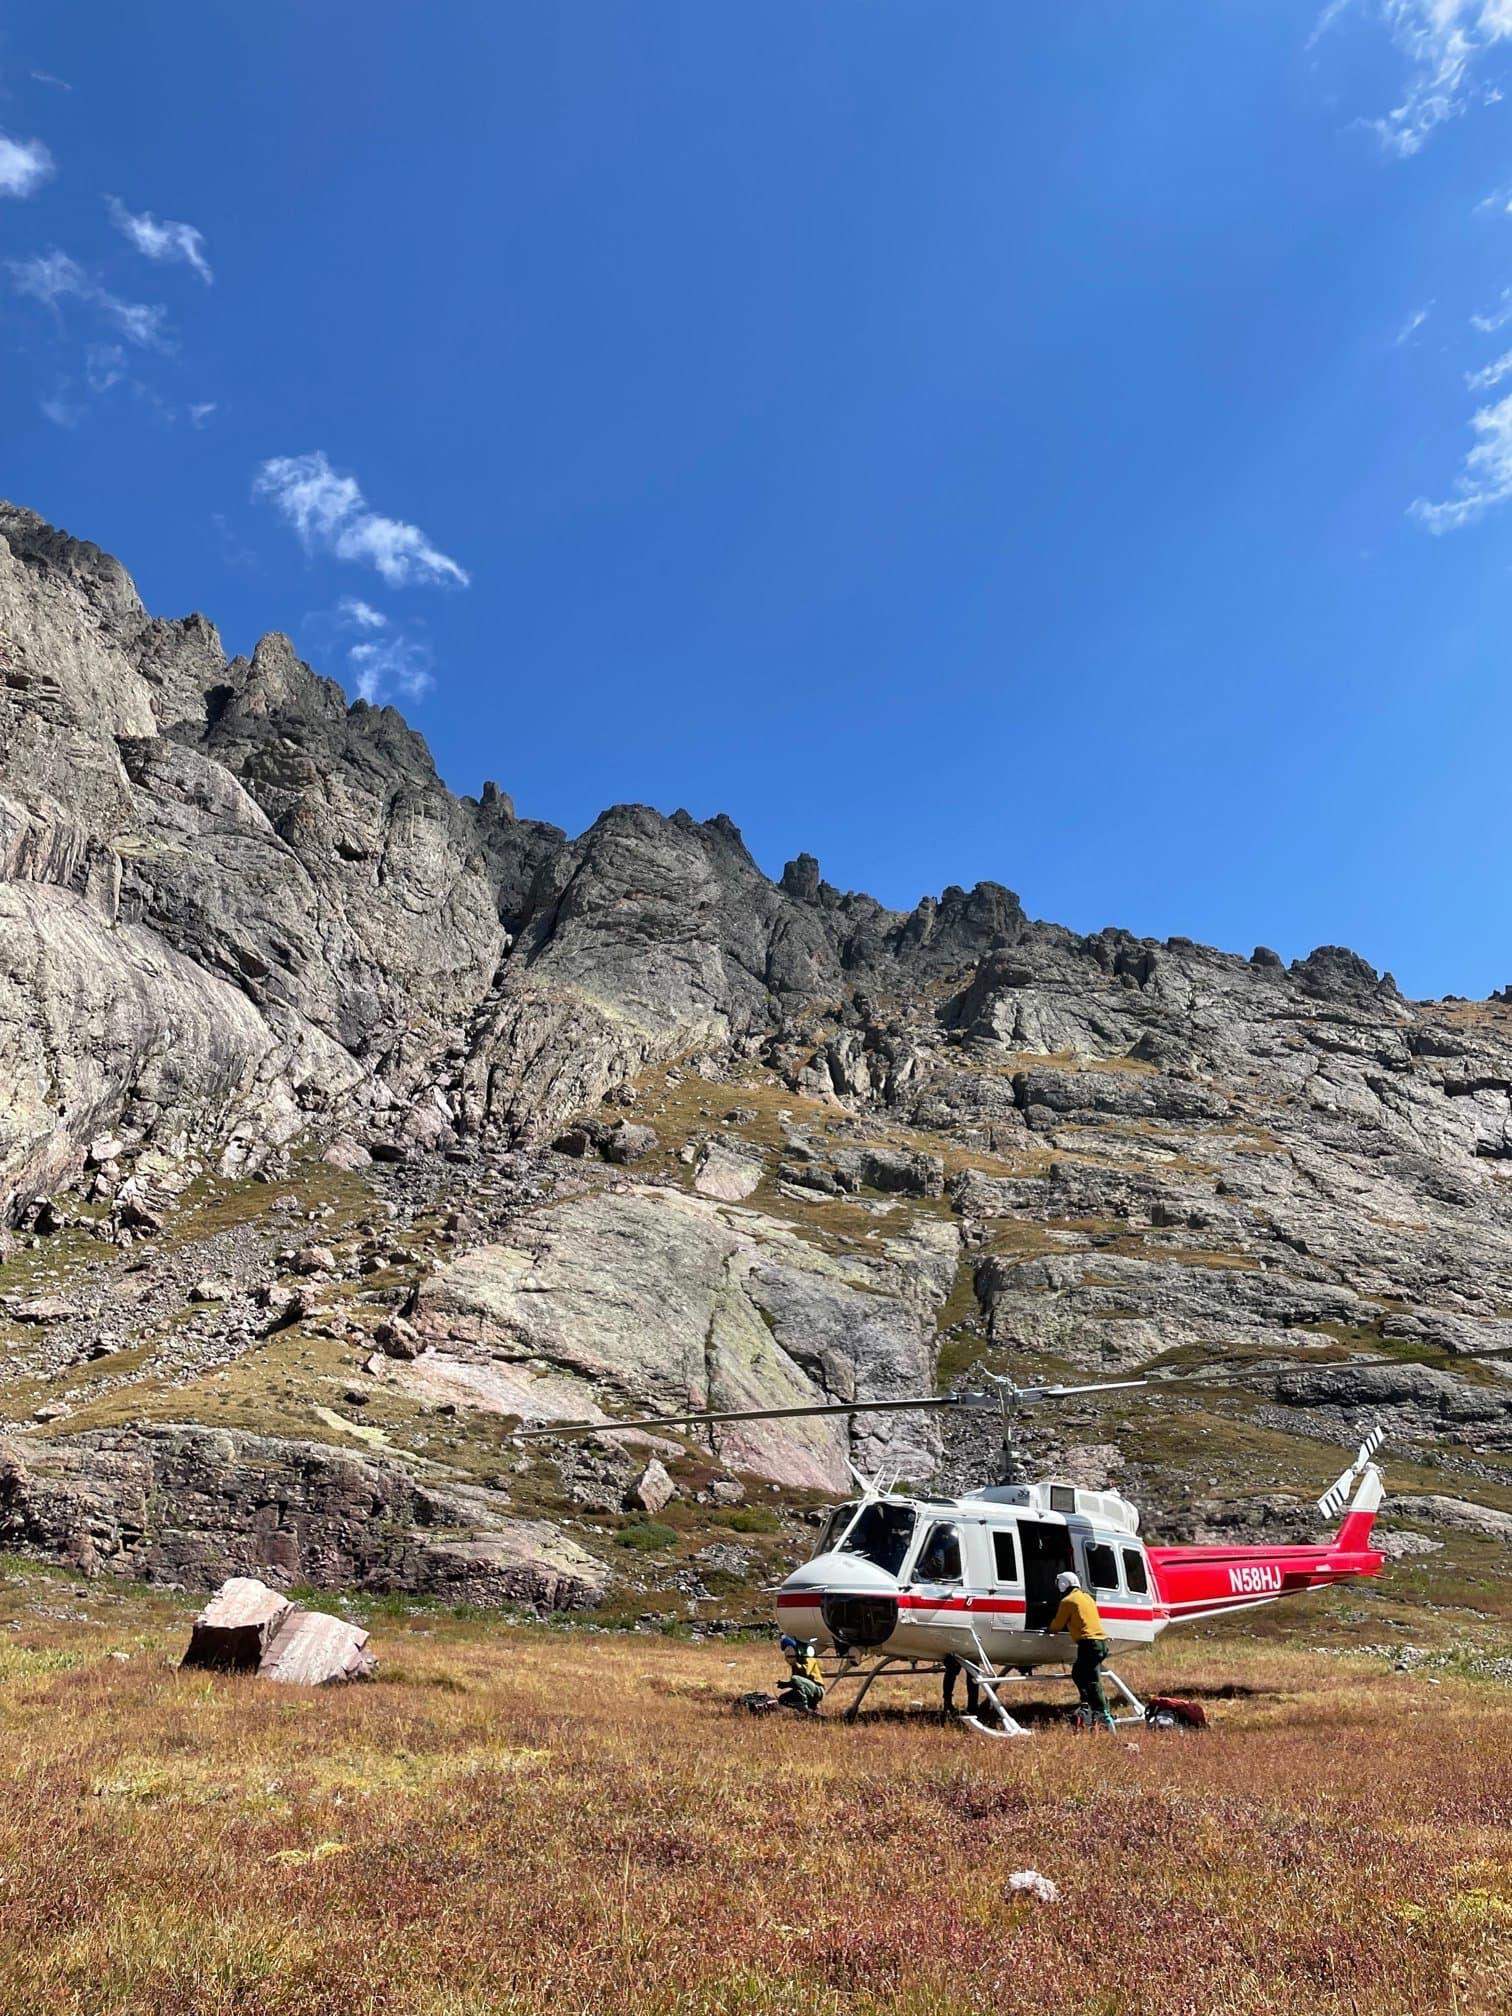 climber killed, Crestone Peak, Crestone needle, colorado,